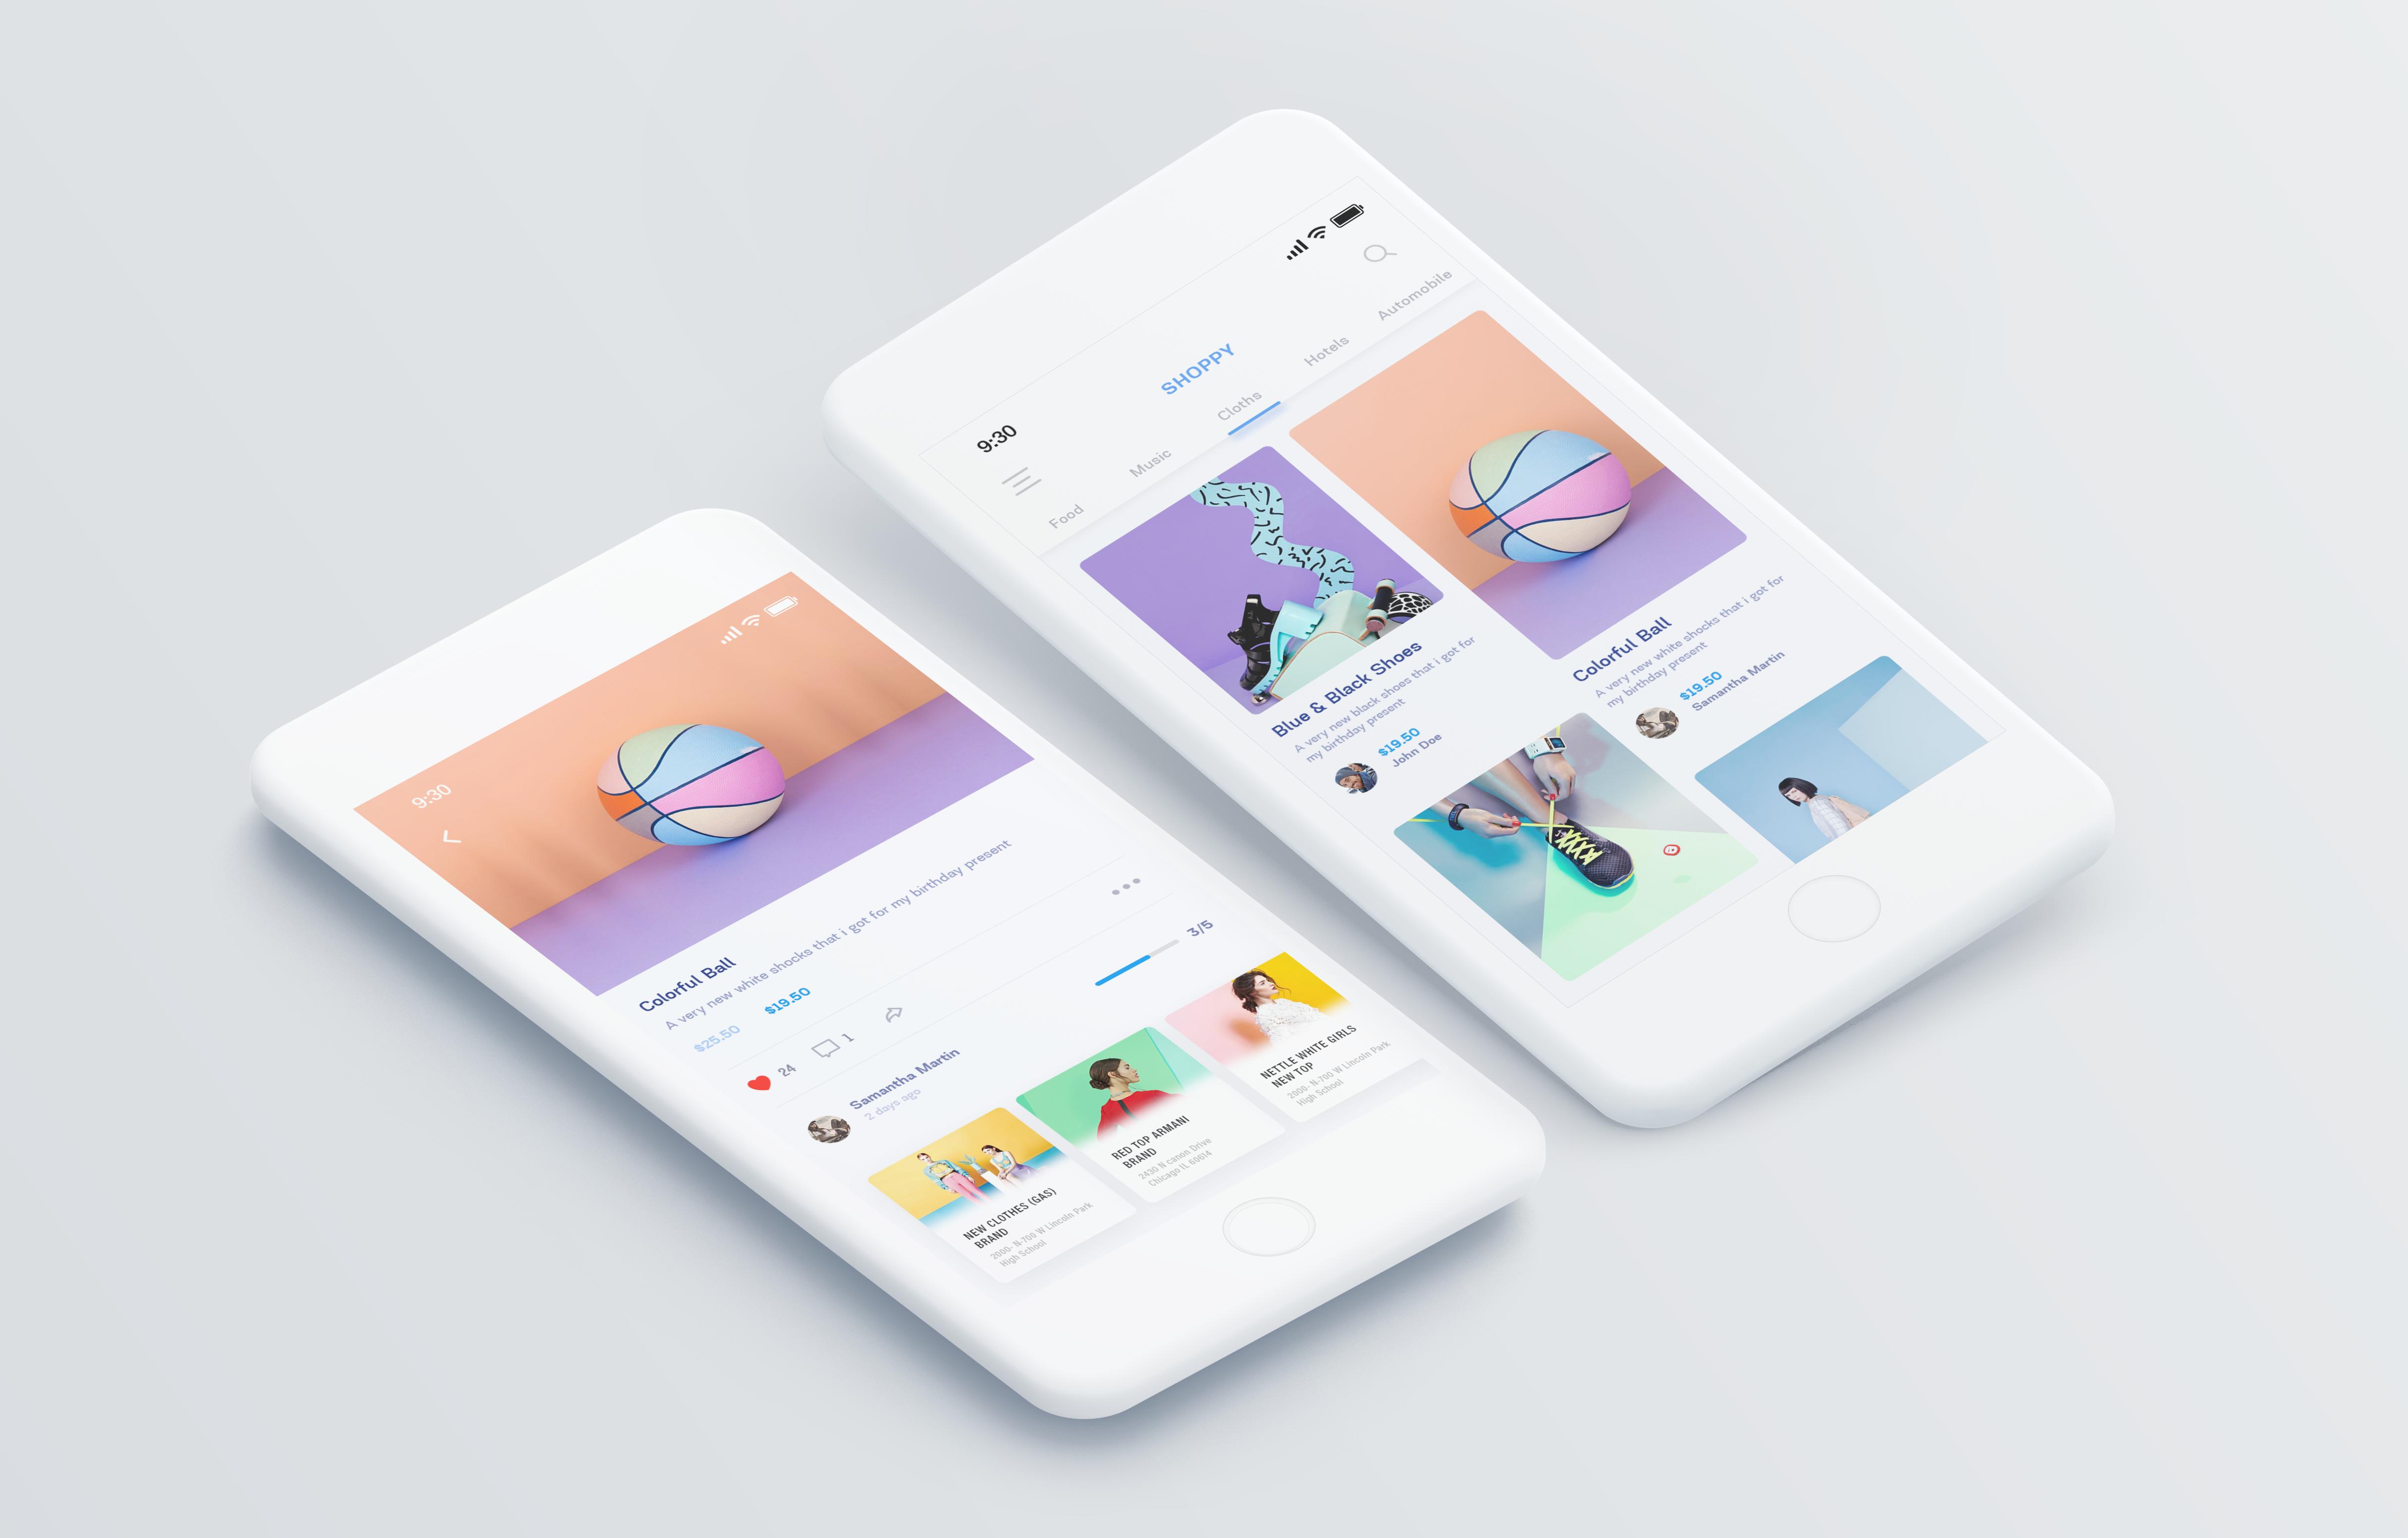 Shoppy App - UpLabs